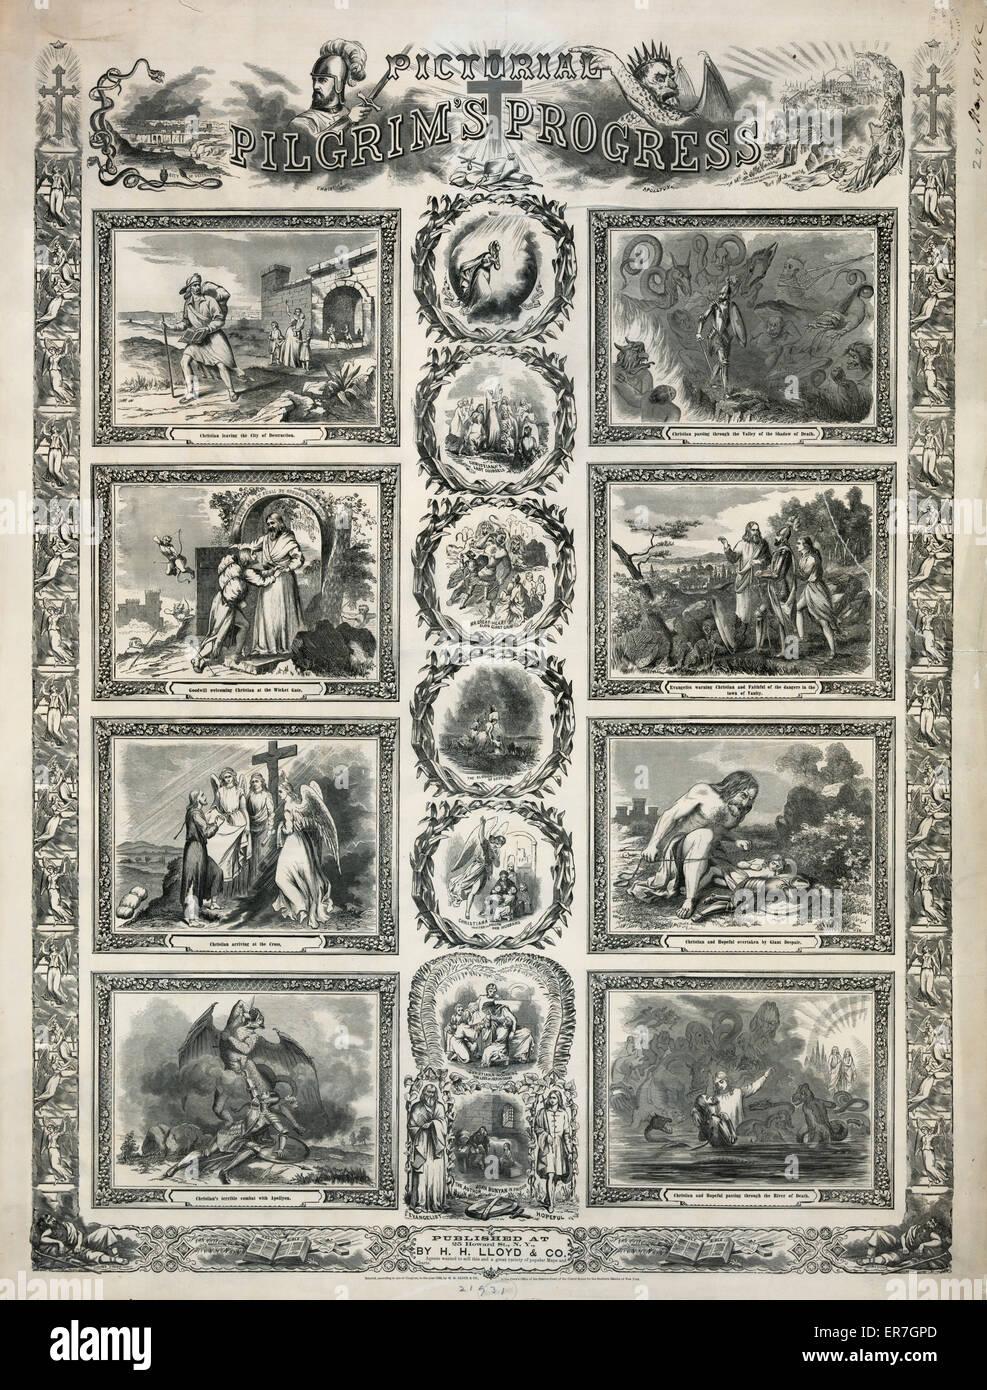 Pictorial pilgrim's progress. Date c1862 May 29. - Stock Image